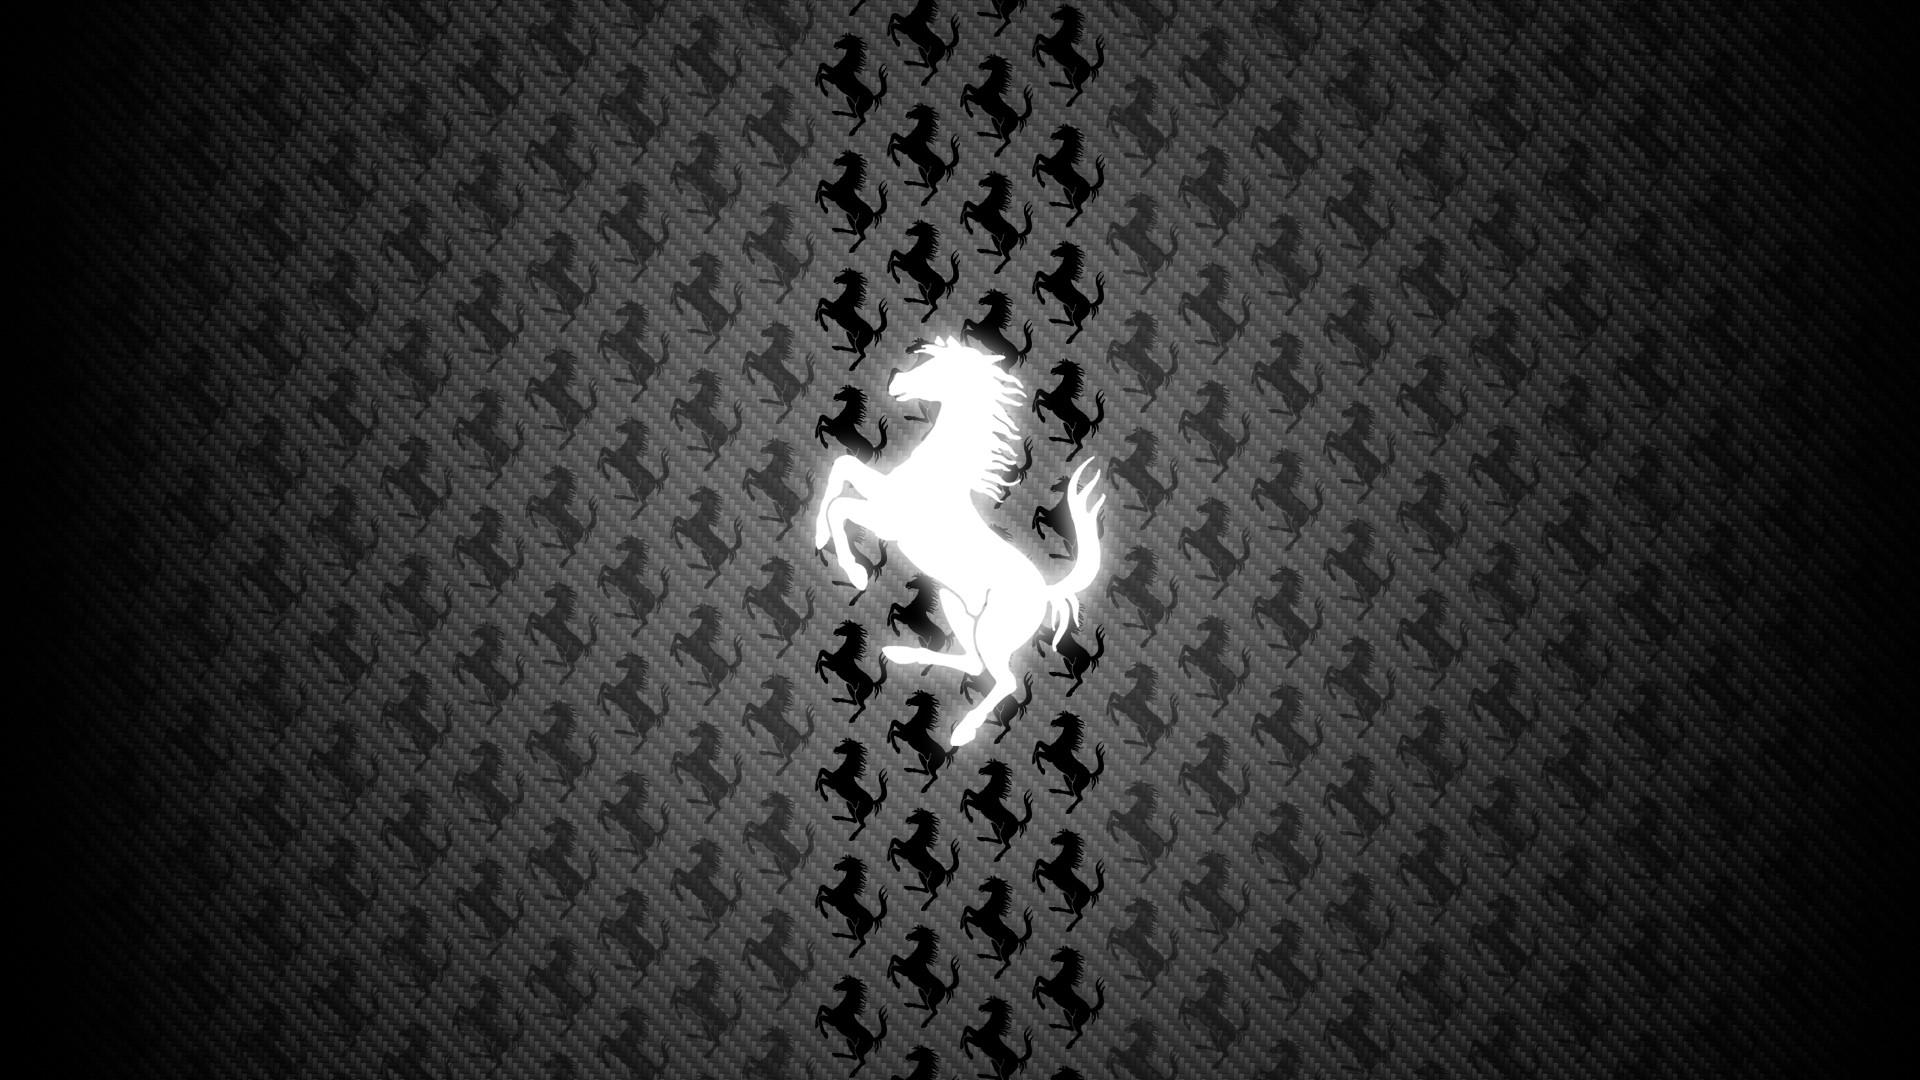 Ferrari Wallpapers and Backgrounds 1920×1080 Imagenes De Ferrari Wallpapers  (31 Wallpapers) |